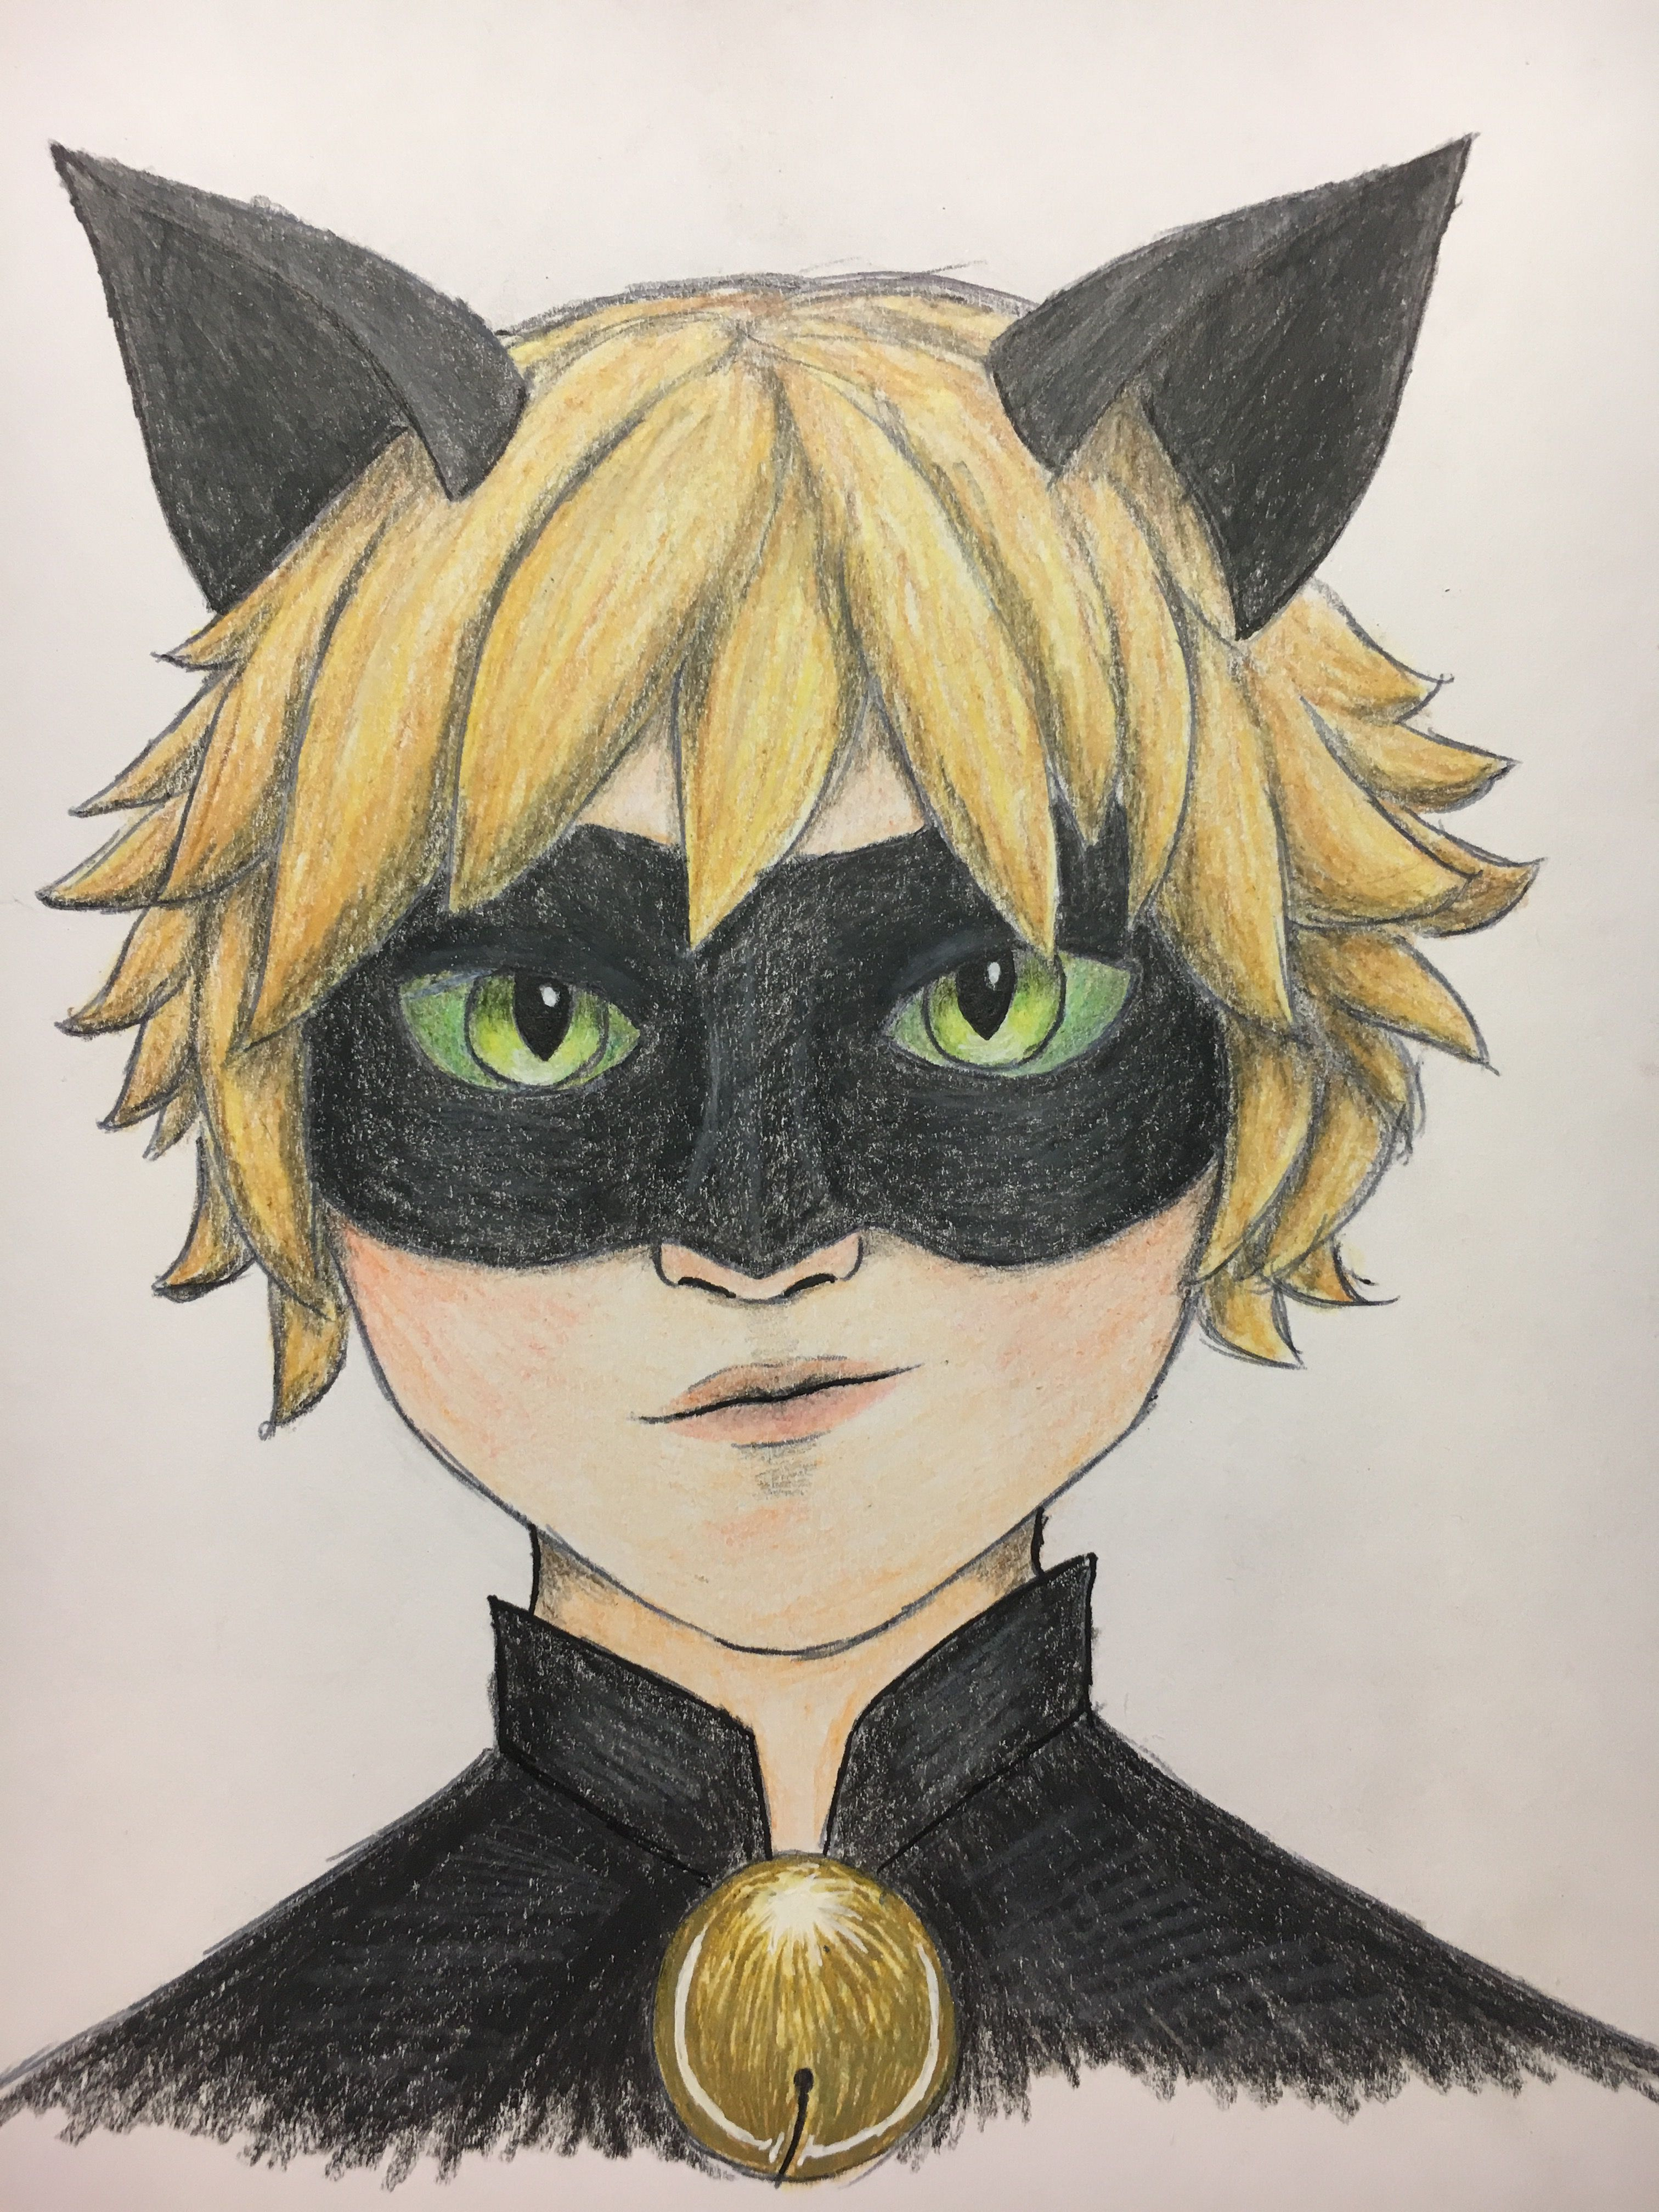 Chat Noir sketch | Art, My arts, Anime